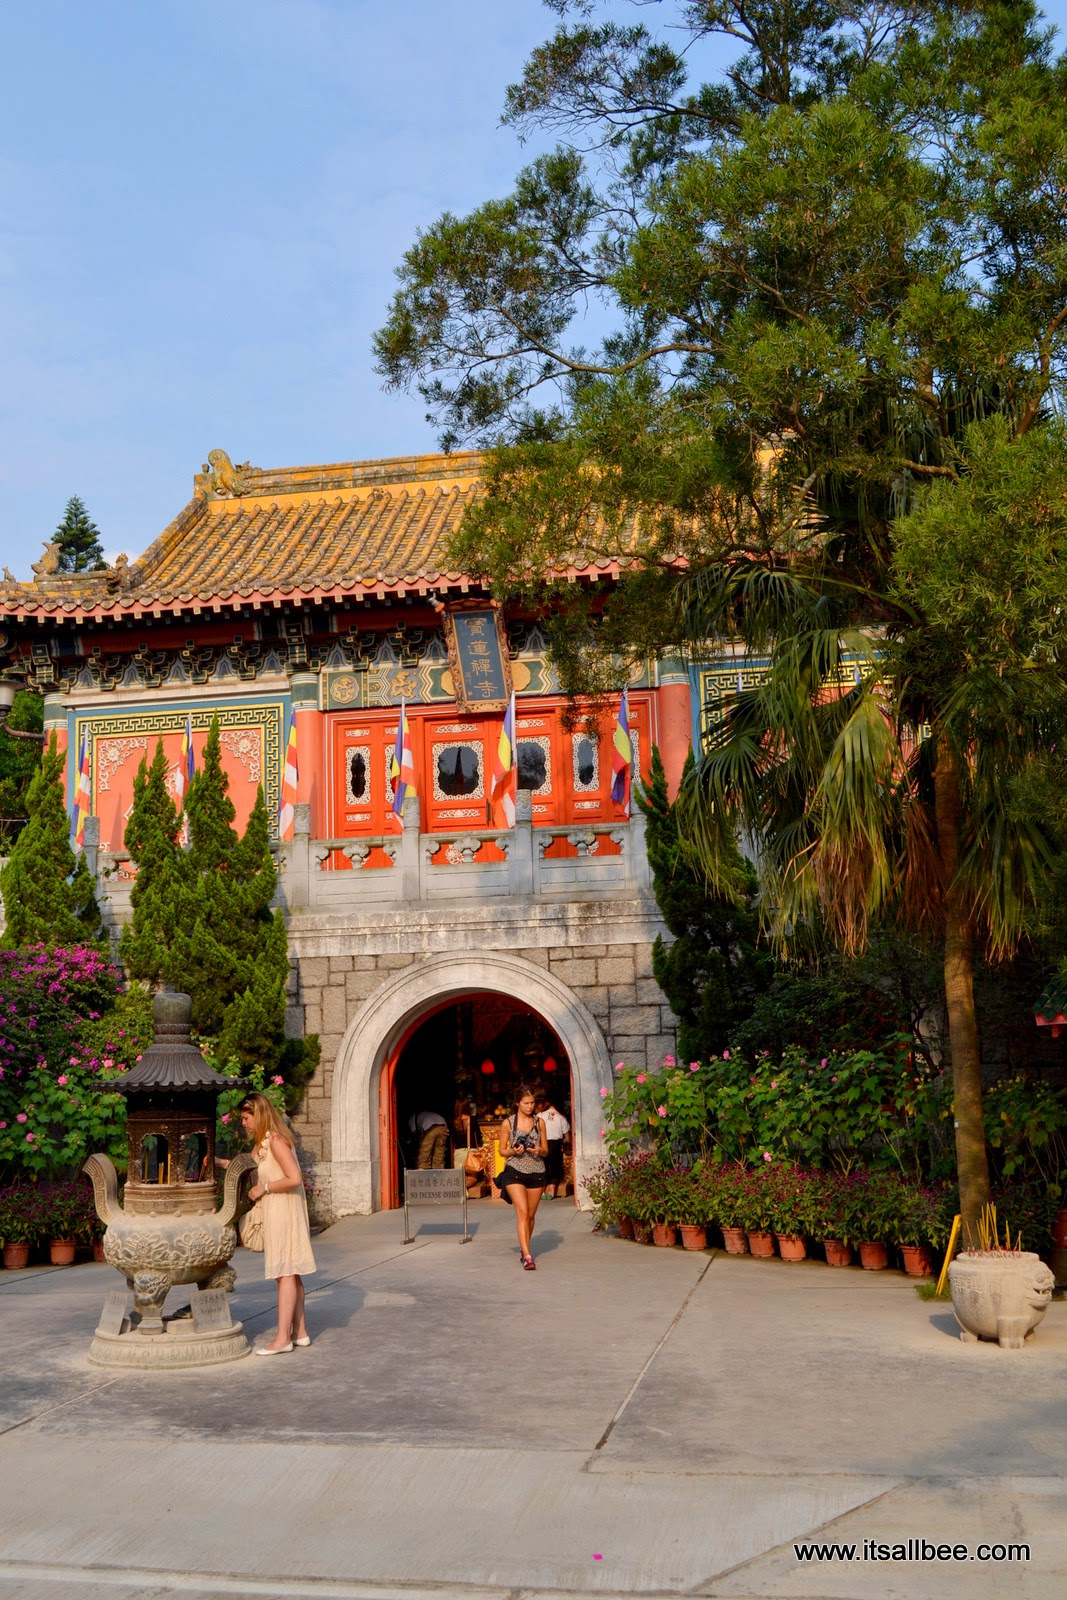 lantau island hk | Big Buddha | Monastery lantau island